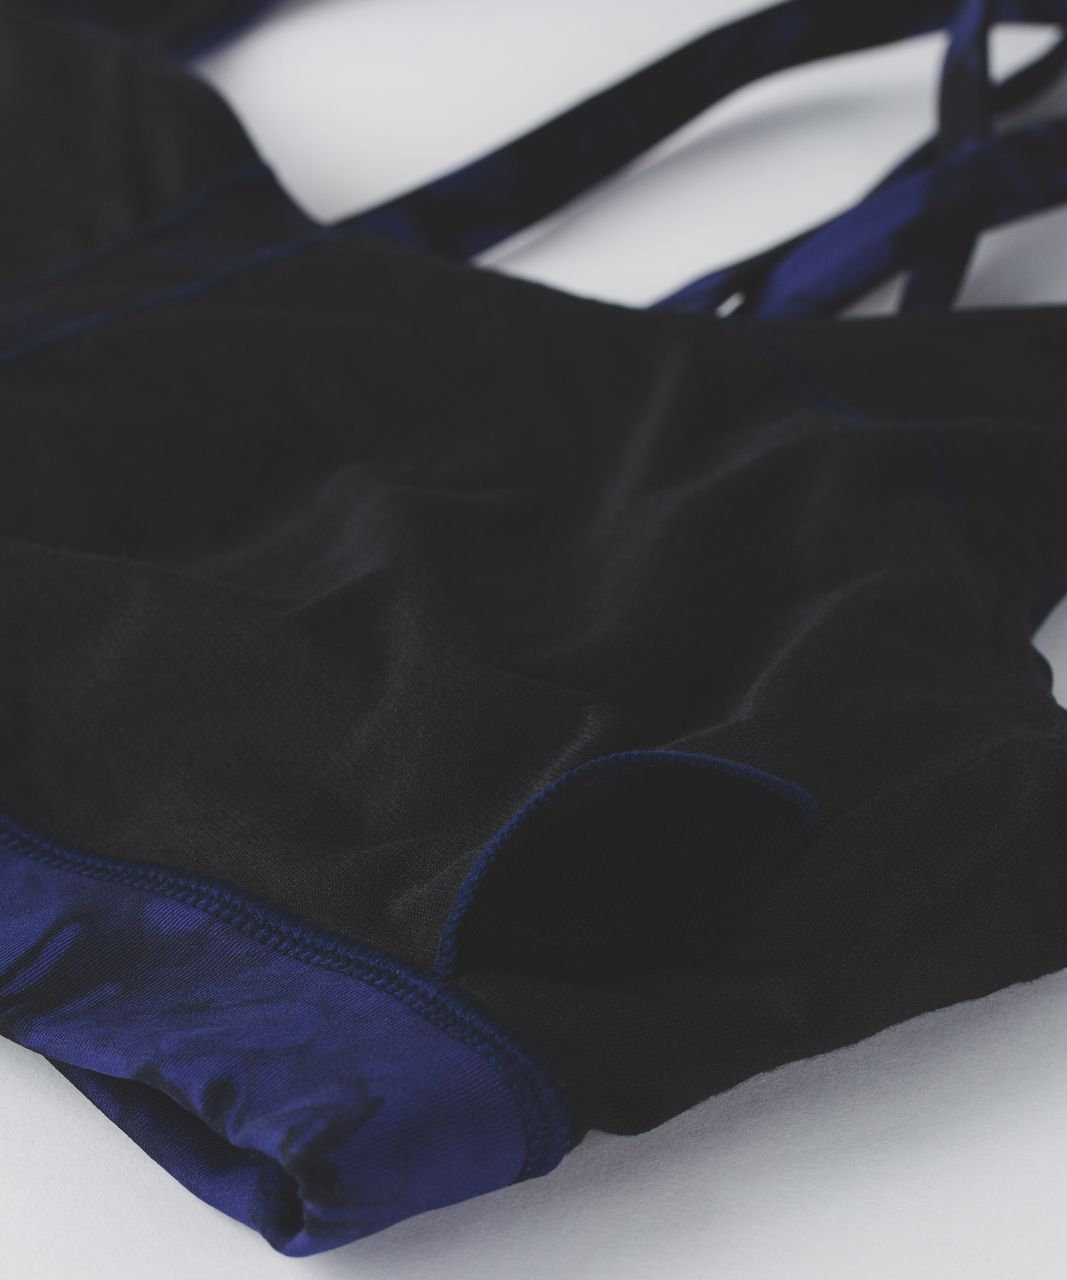 Lululemon Energy Bra (Shibori) - Shibori Emporer Blue Black